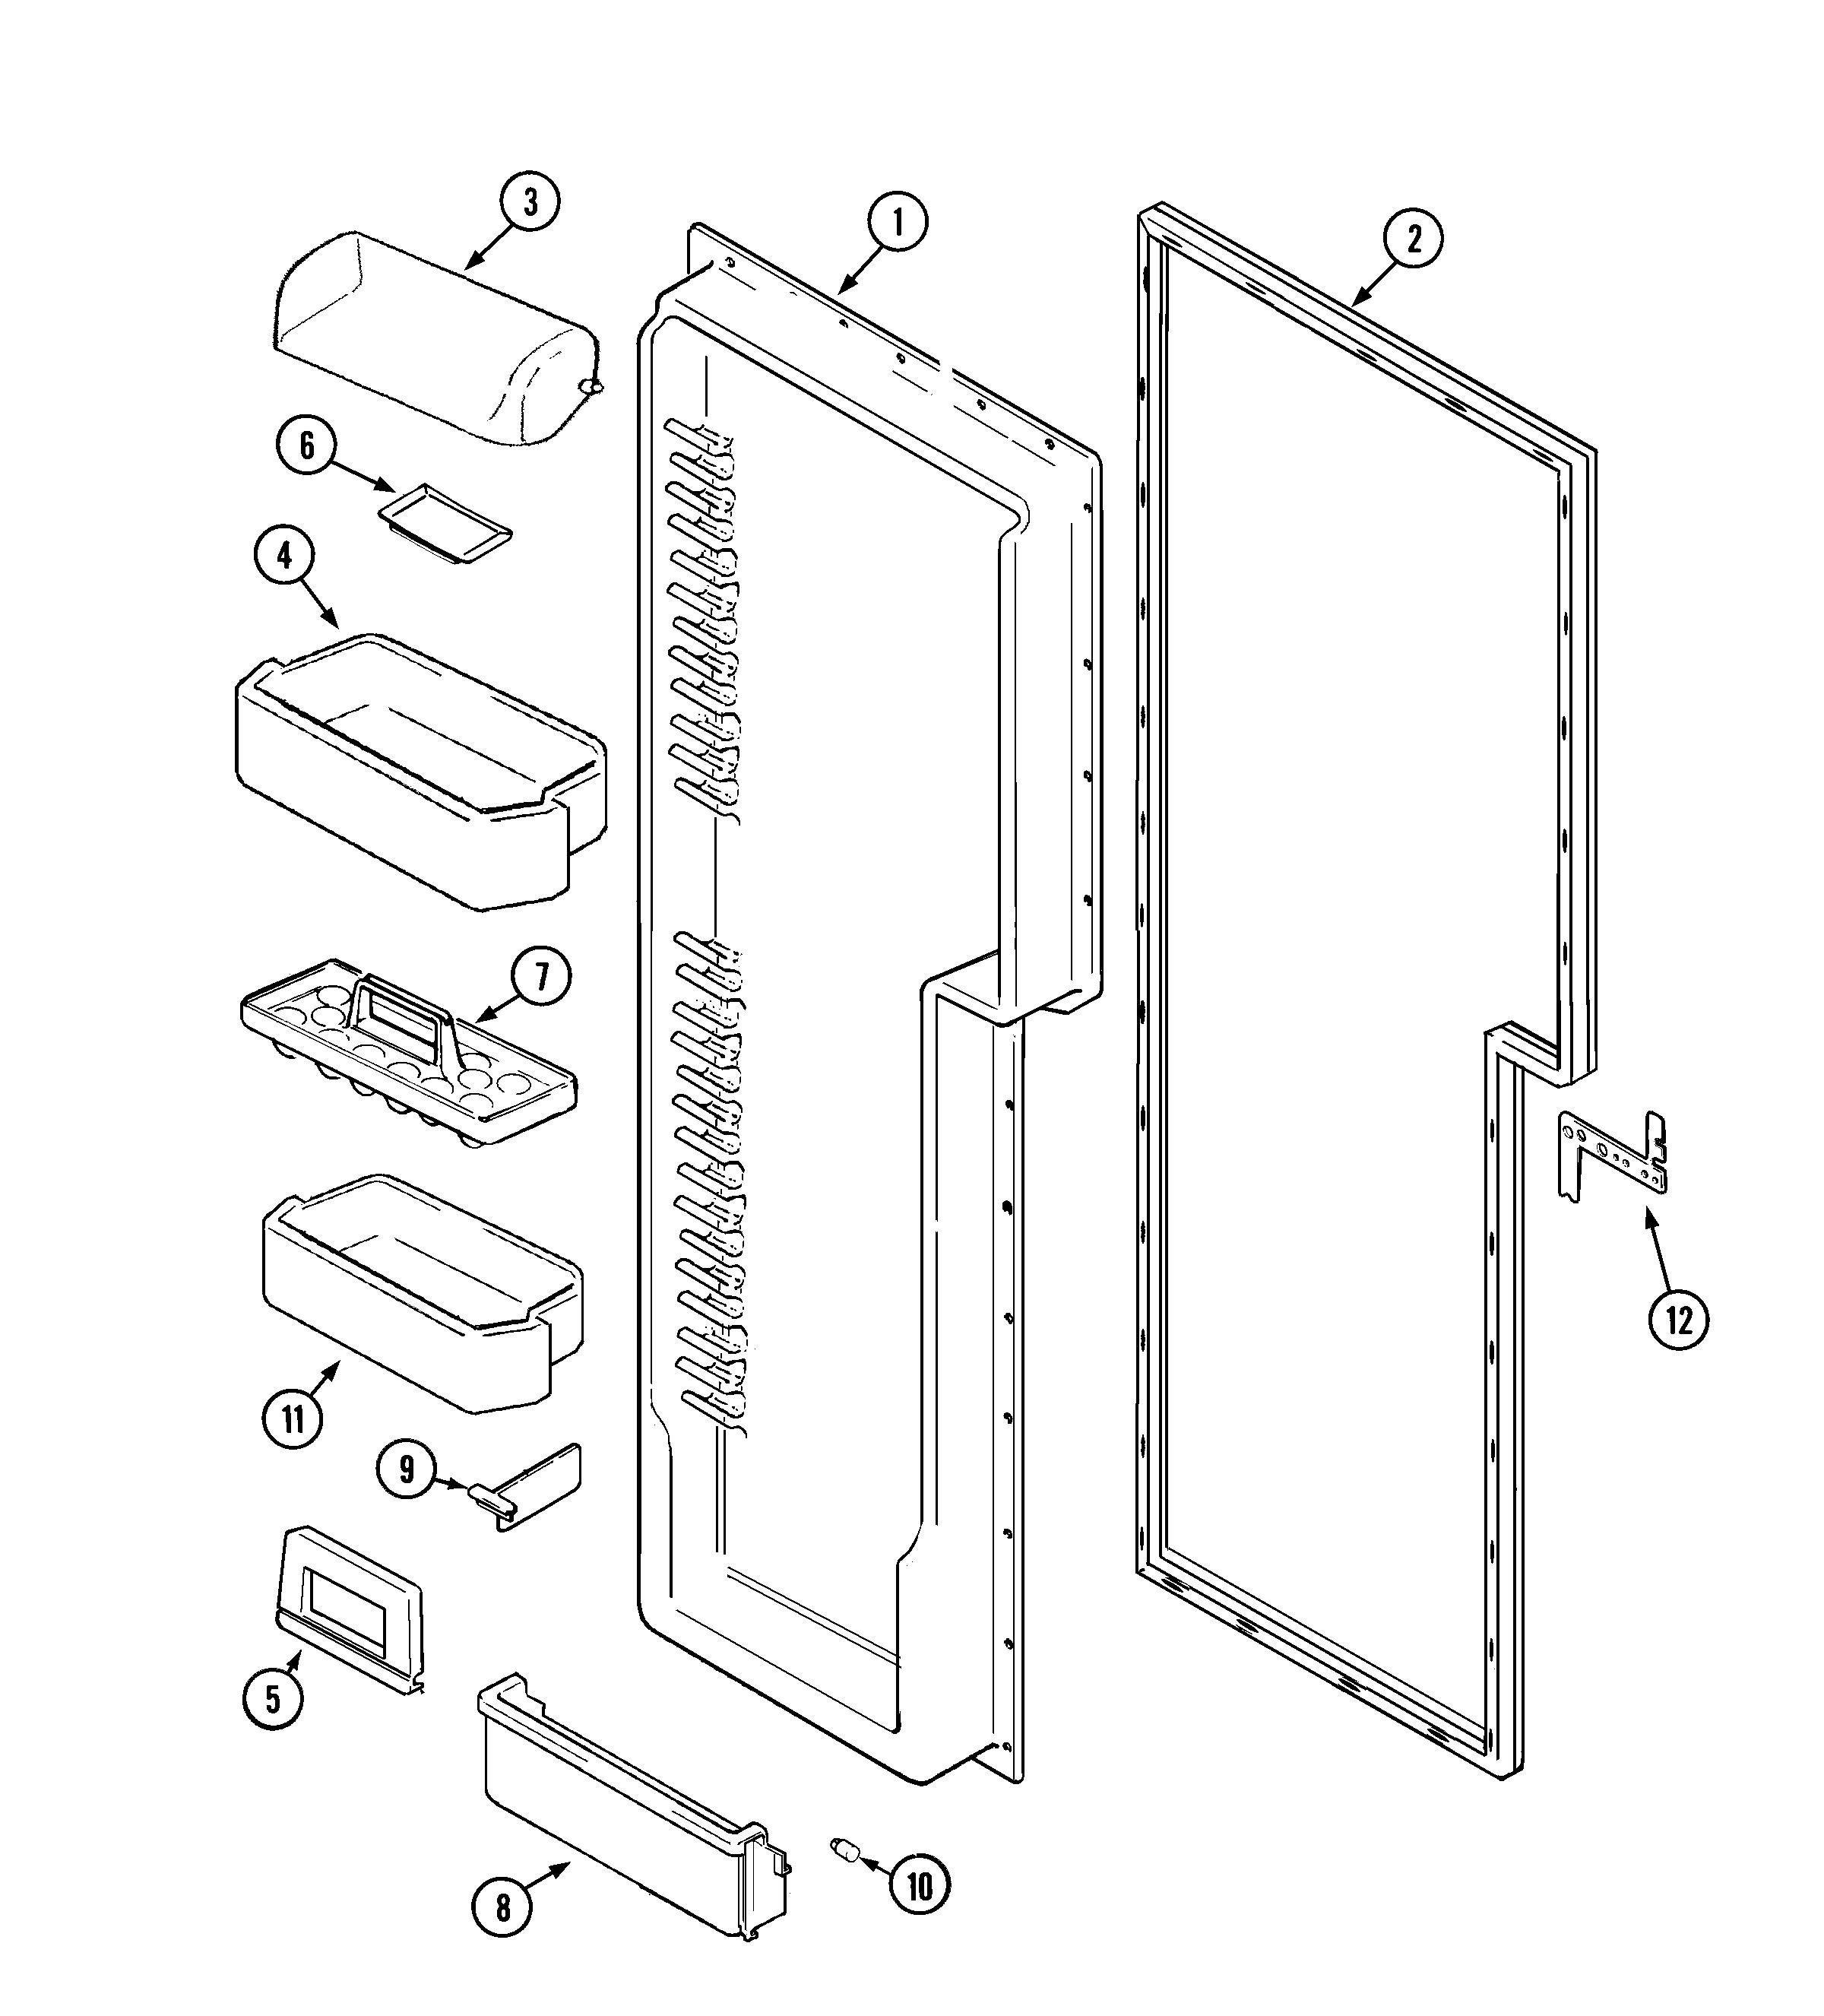 Maytag  Side-By-Side Refrigerator  Fresh food inner door